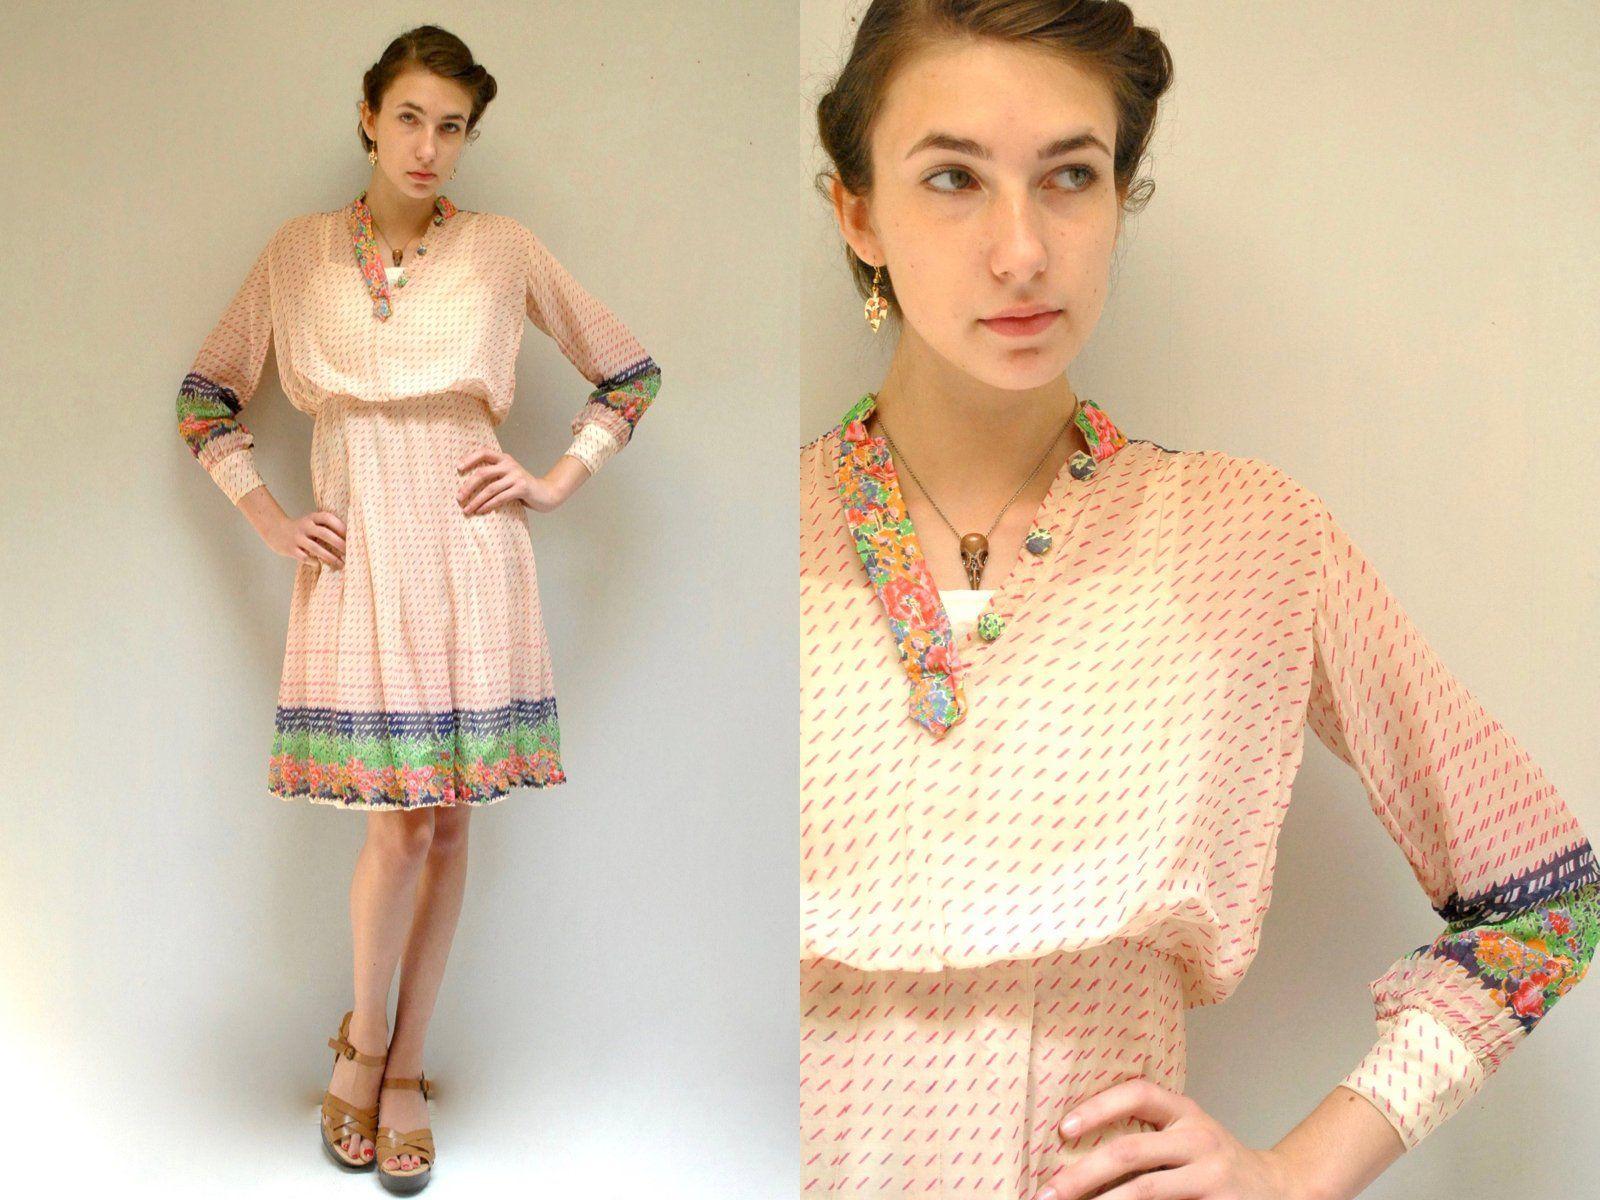 1e57206eb8 70s SHEER COTTON DRESS   1970s Vintage Midi Gauze Cotton Boho Long Sleeve  Rainbow Floral Summer Shirt Dress Womens HandMade Sheer Pleated